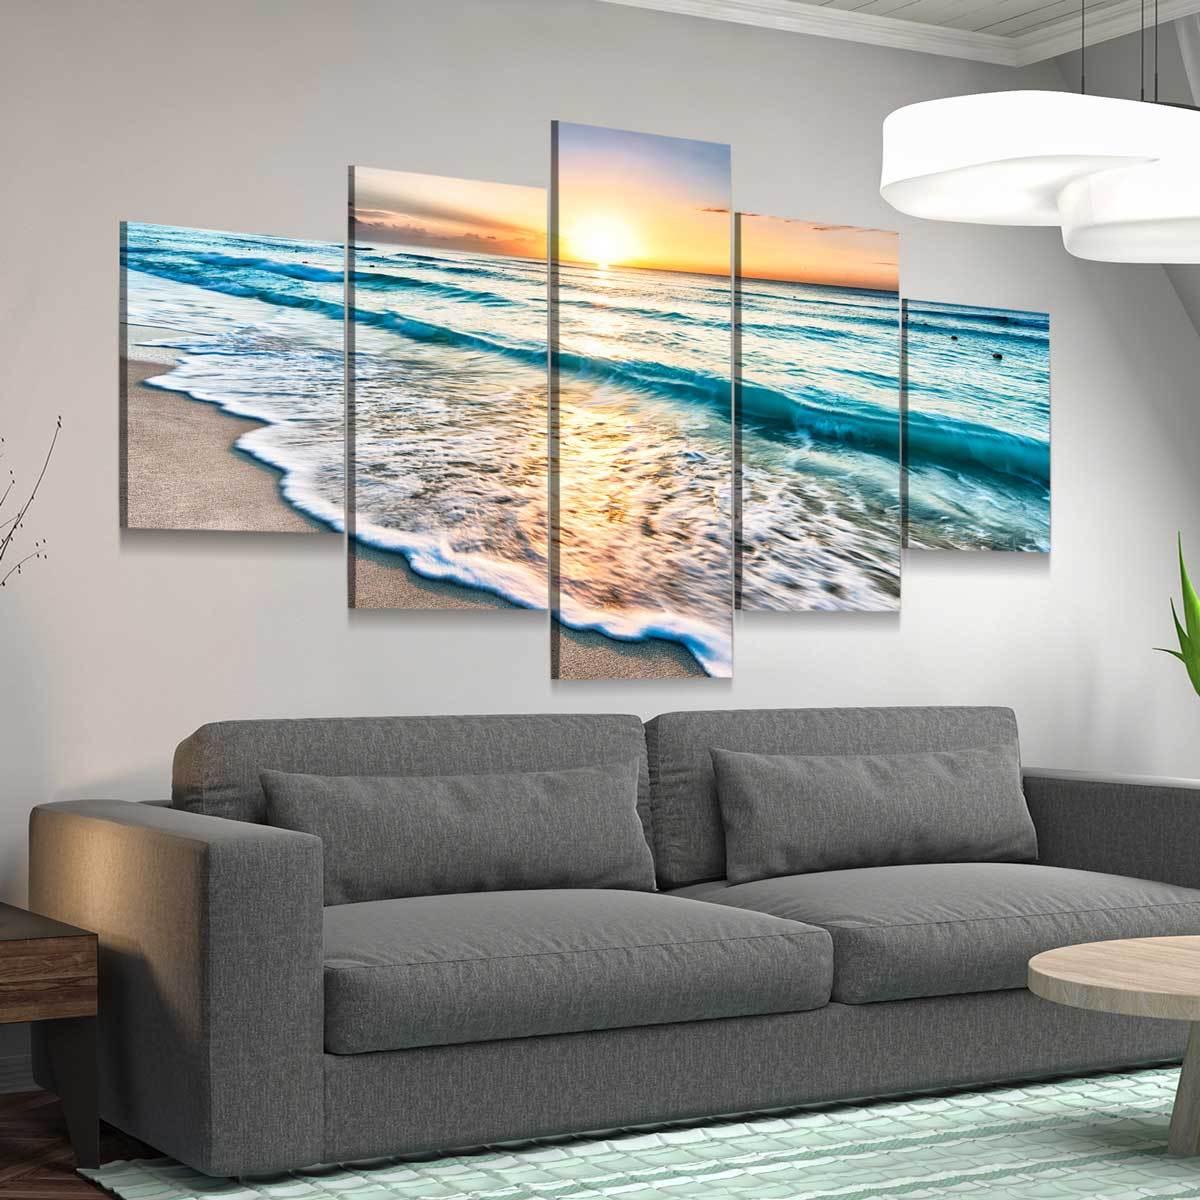 Sunrise Over Cancun Beach 5 panel canvas wall art